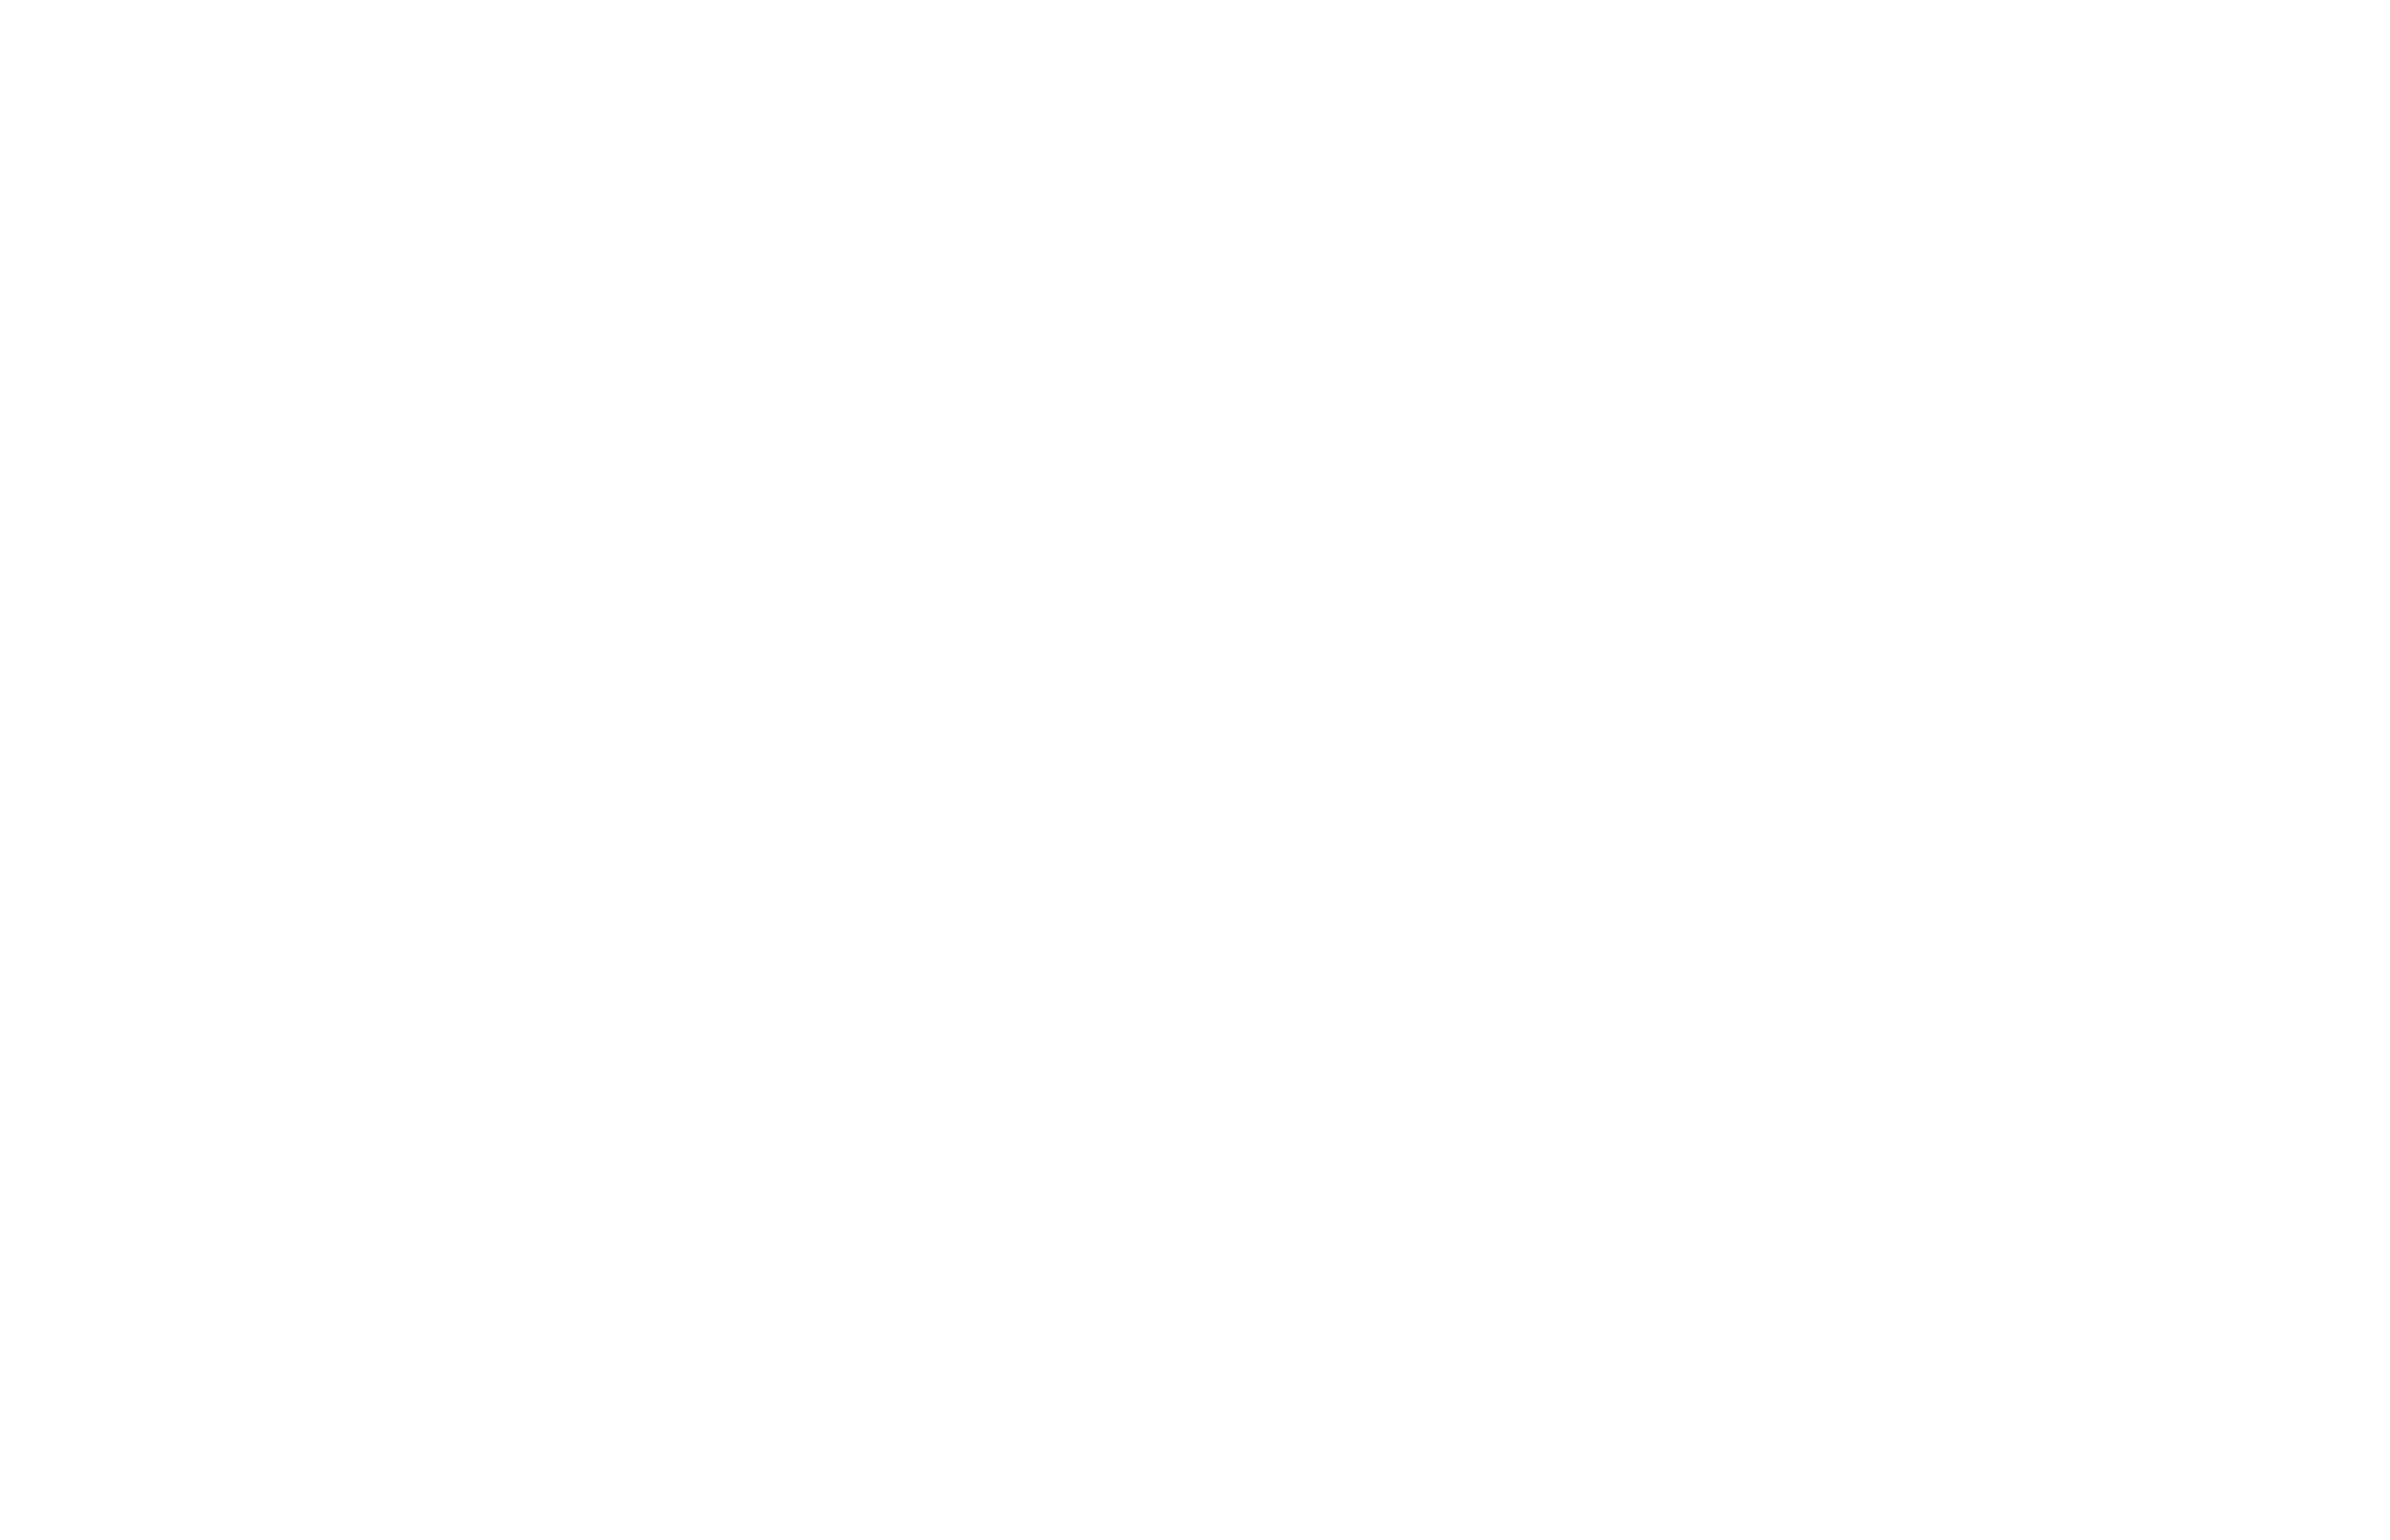 UJC-AC copyWhite.png